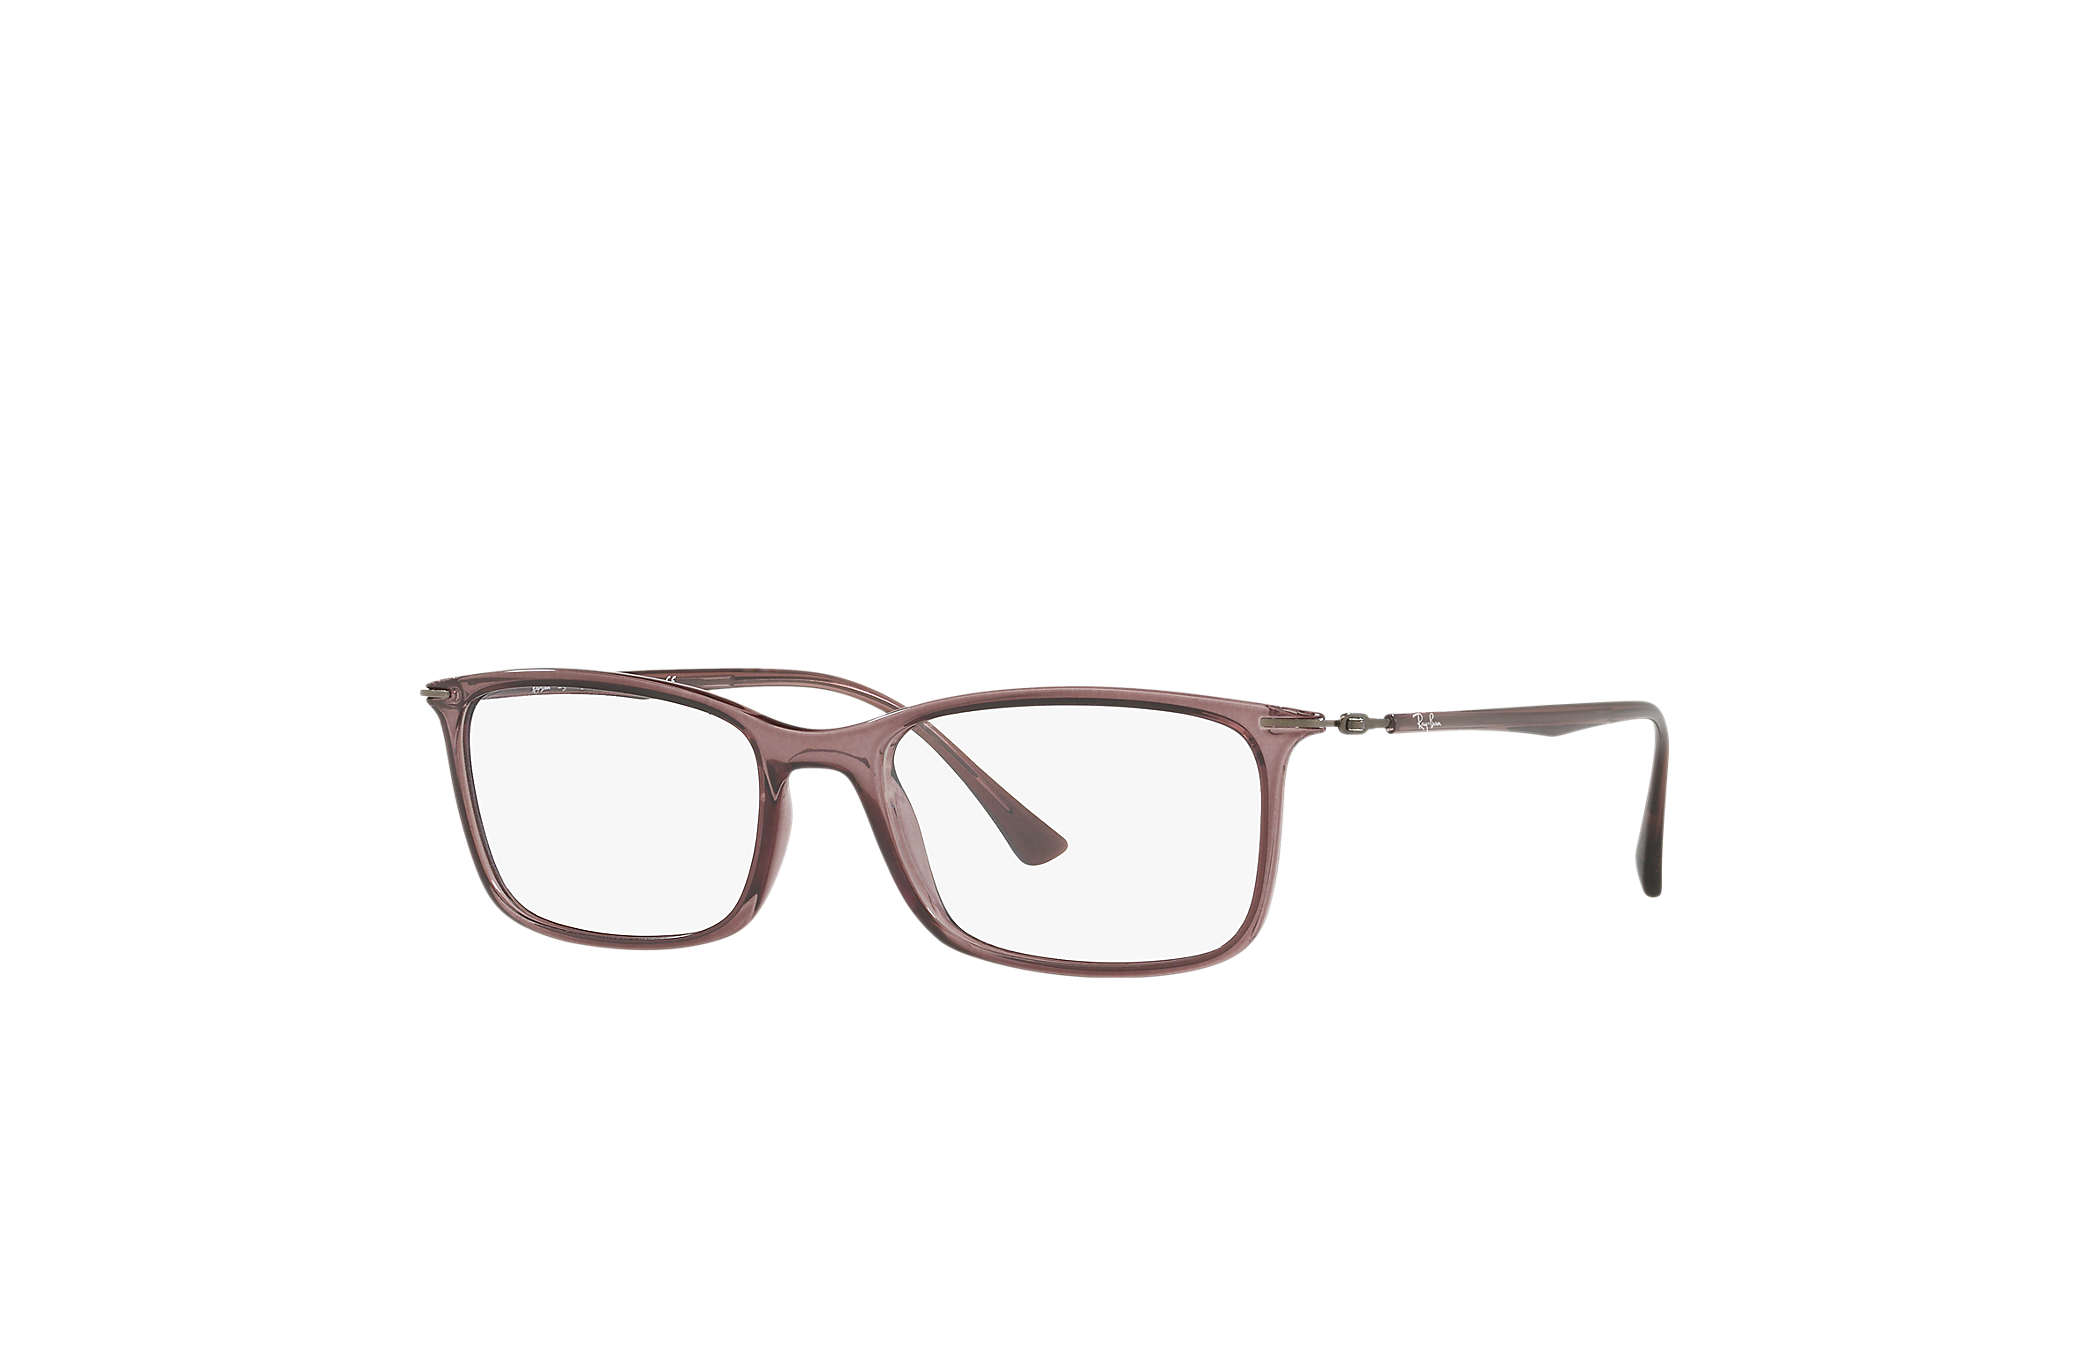 d0b90aa23453d Ray-Ban eyeglasses RB7031 Violet - Nylon - 0RX7031574053